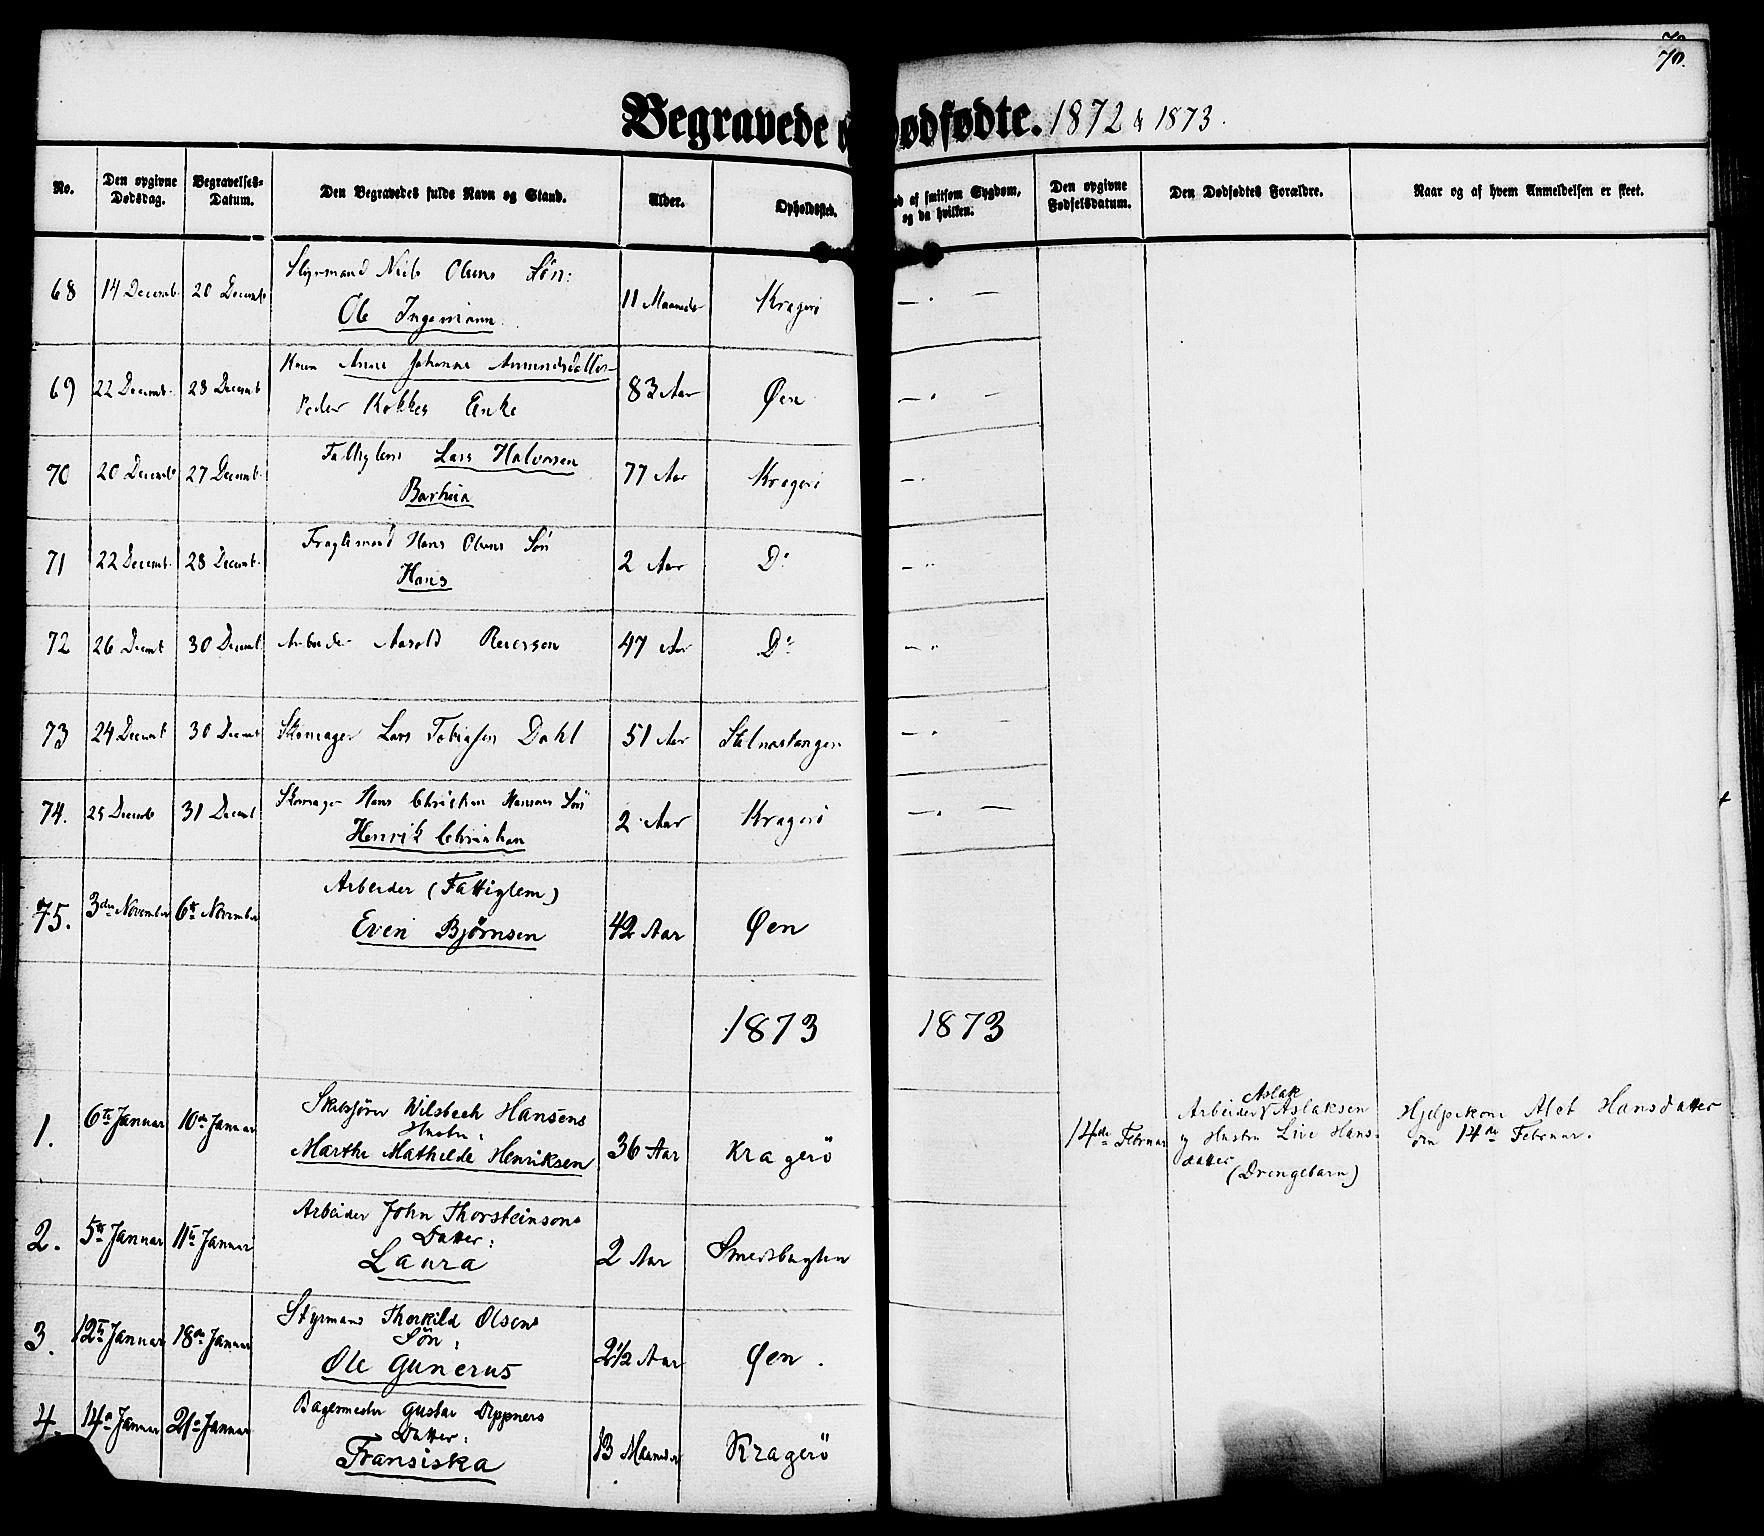 SAKO, Kragerø kirkebøker, F/Fa/L0010: Ministerialbok nr. 10, 1861-1885, s. 70